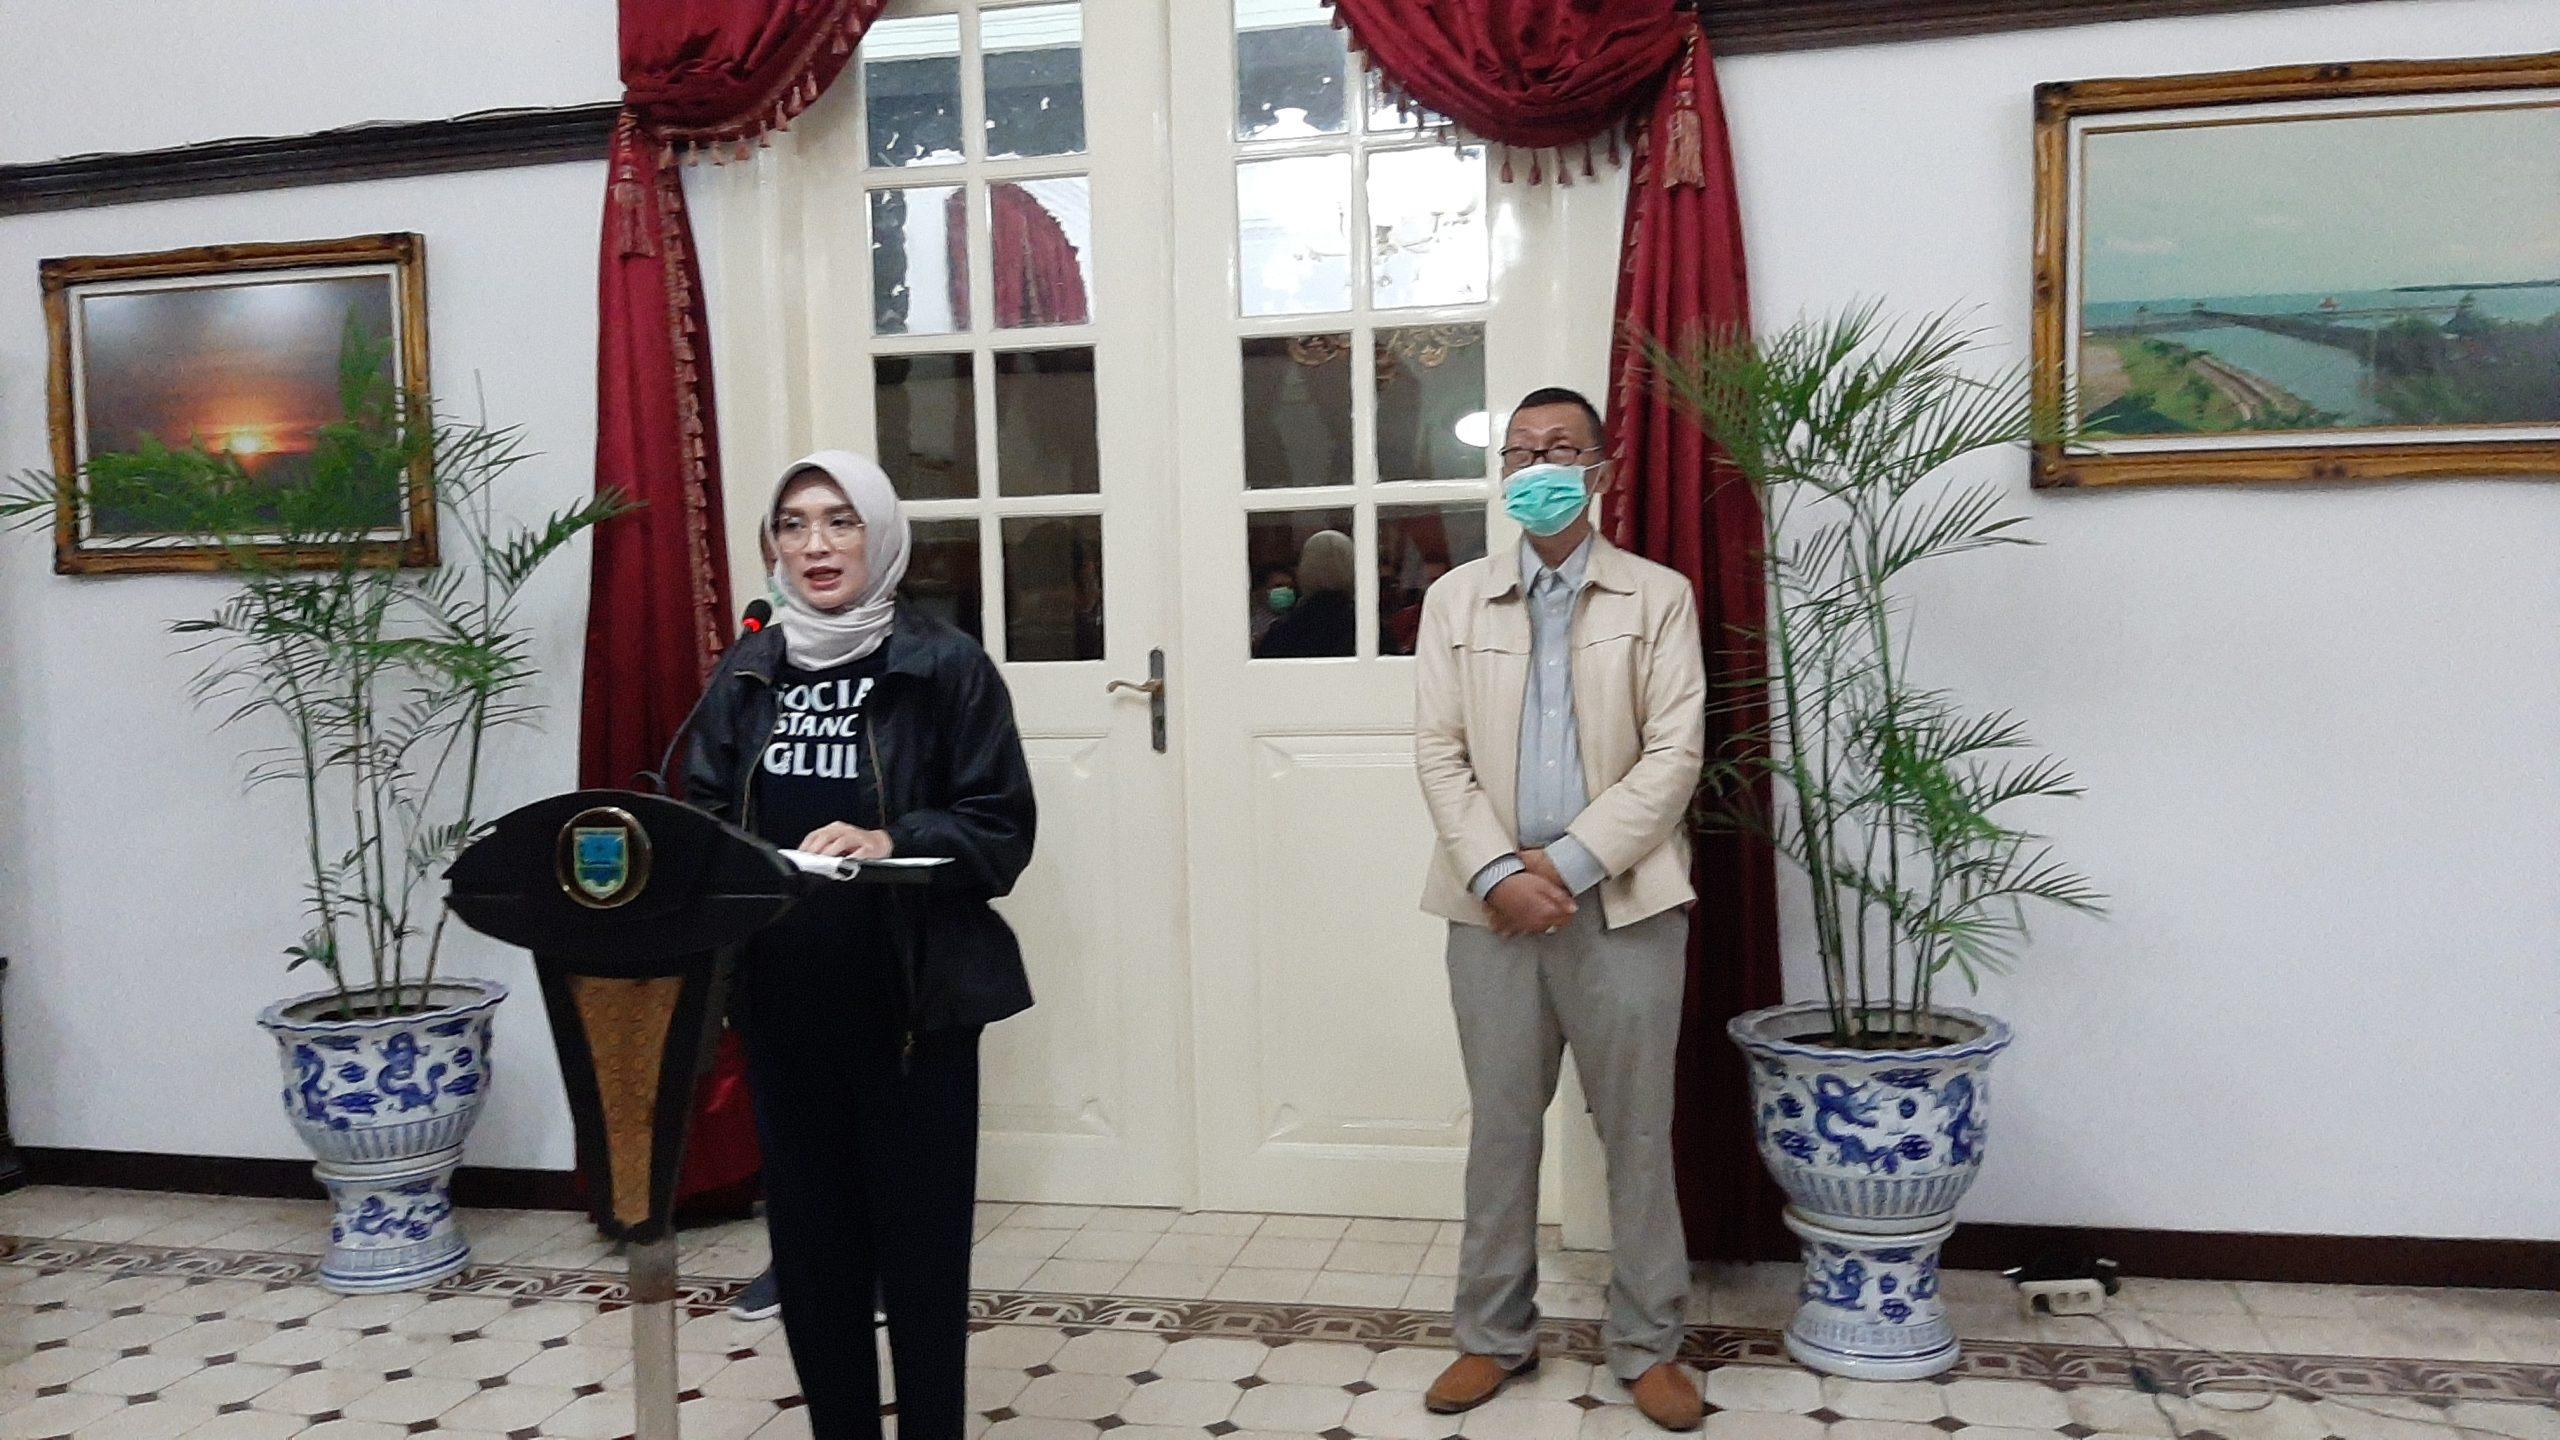 Masuk Zona Merah Corona Kabupaten Probolinggo, Menambah Daftar Zona Merah di Jatim Menjadi 32